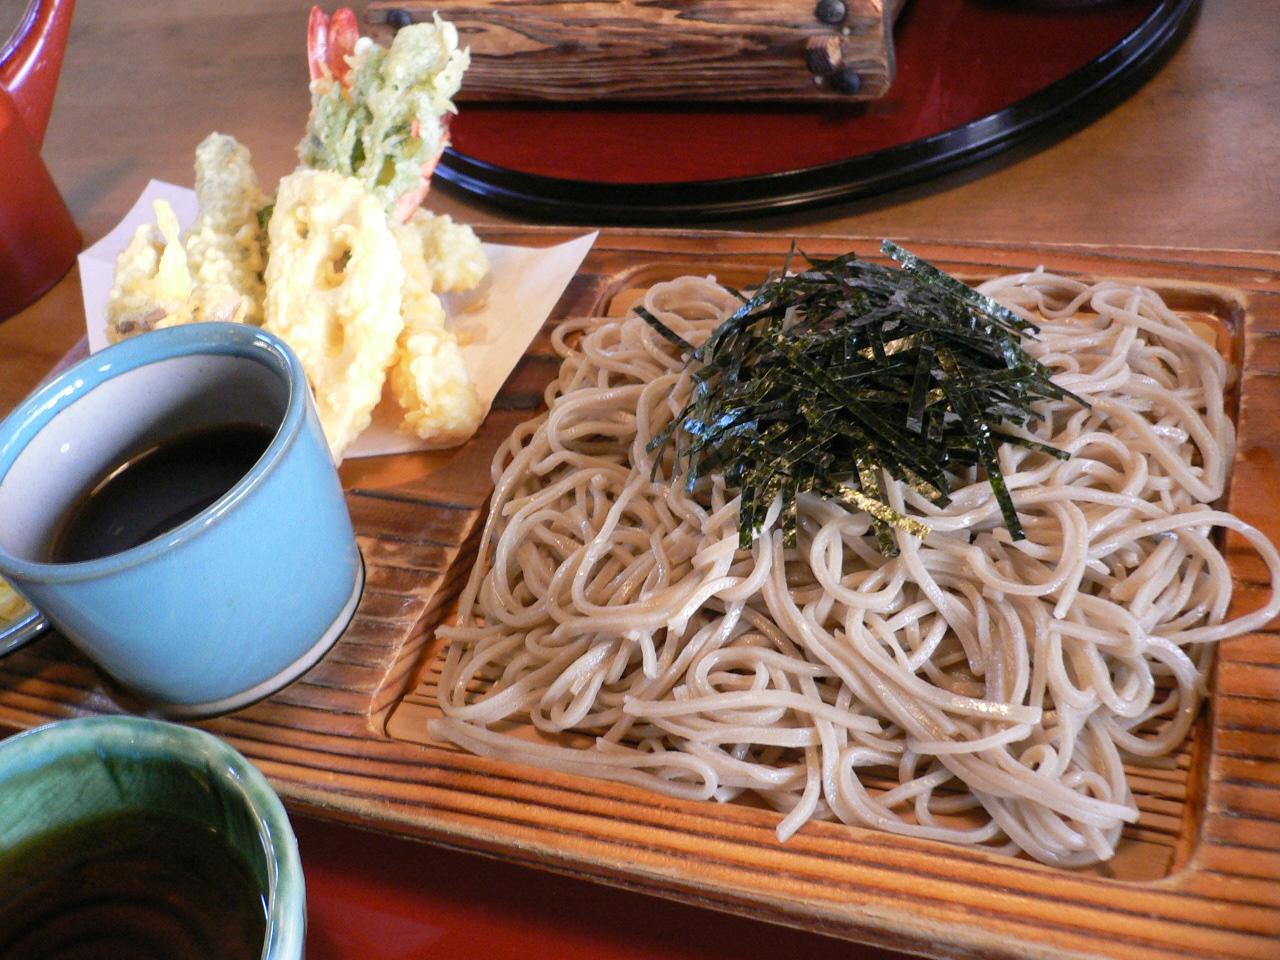 Shinshu_soba,_ten_zaru_by_hirotomo_in_Suwa,_Nagano.jpg